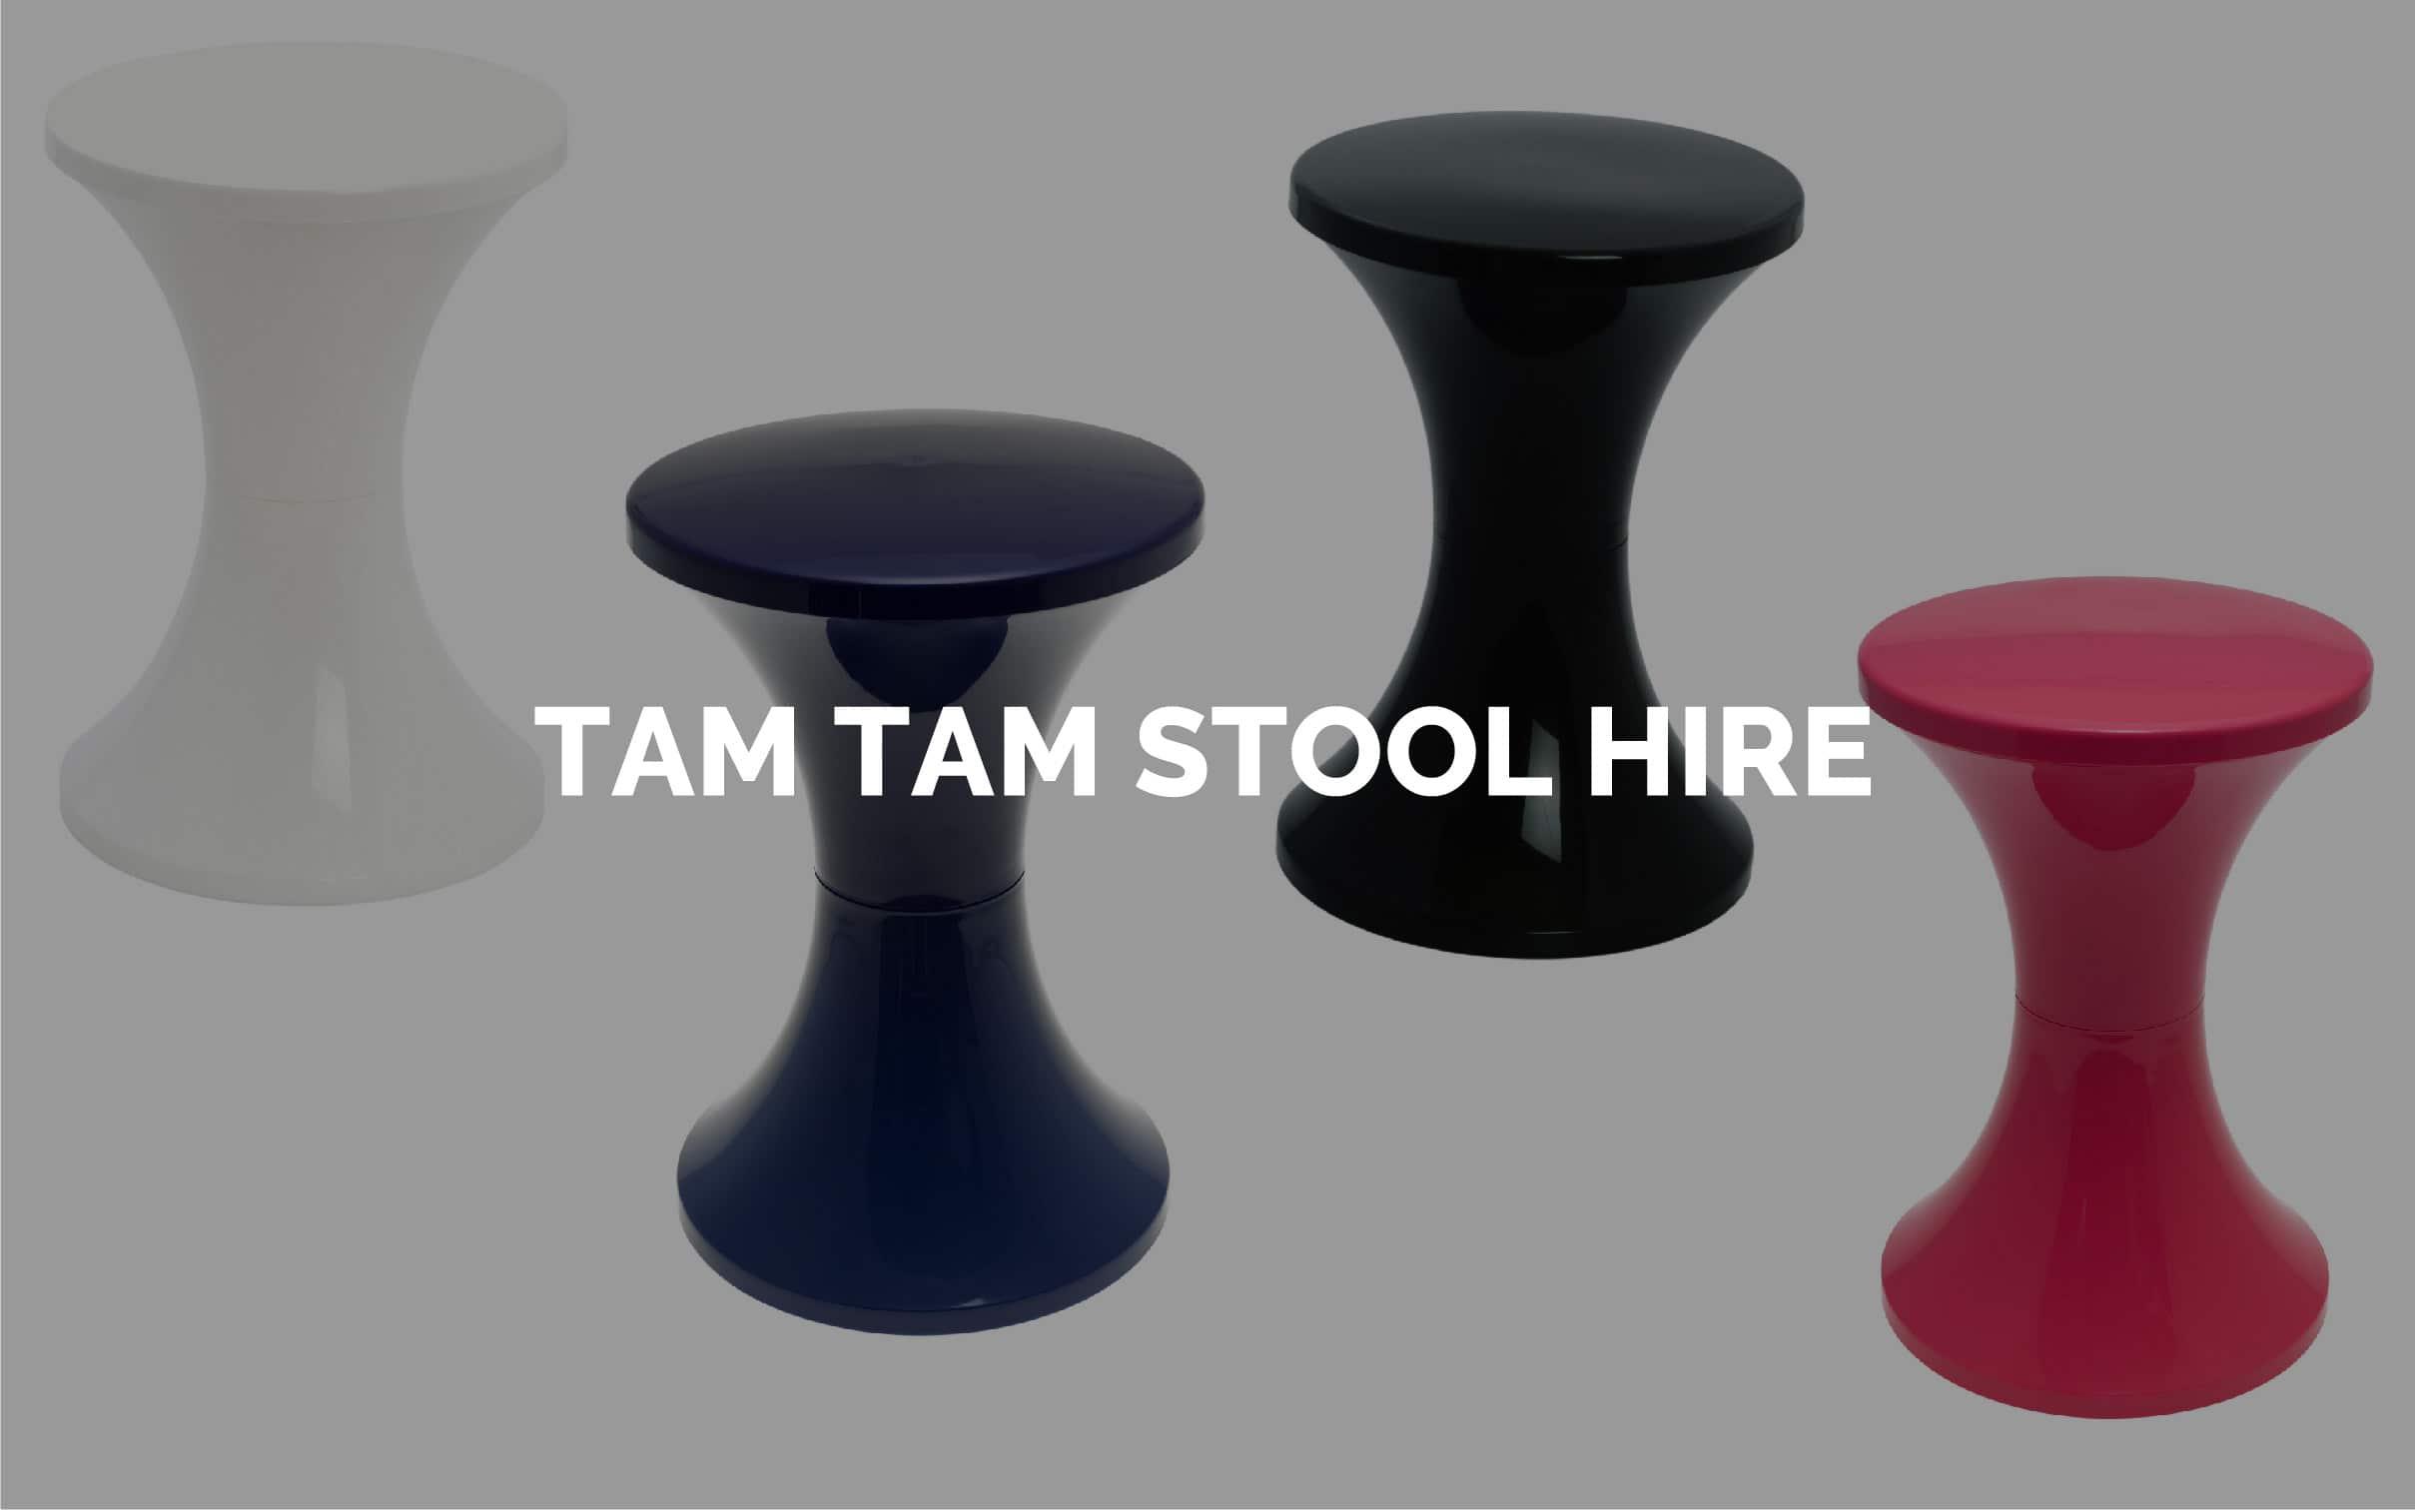 Tam Tam Stool Hire